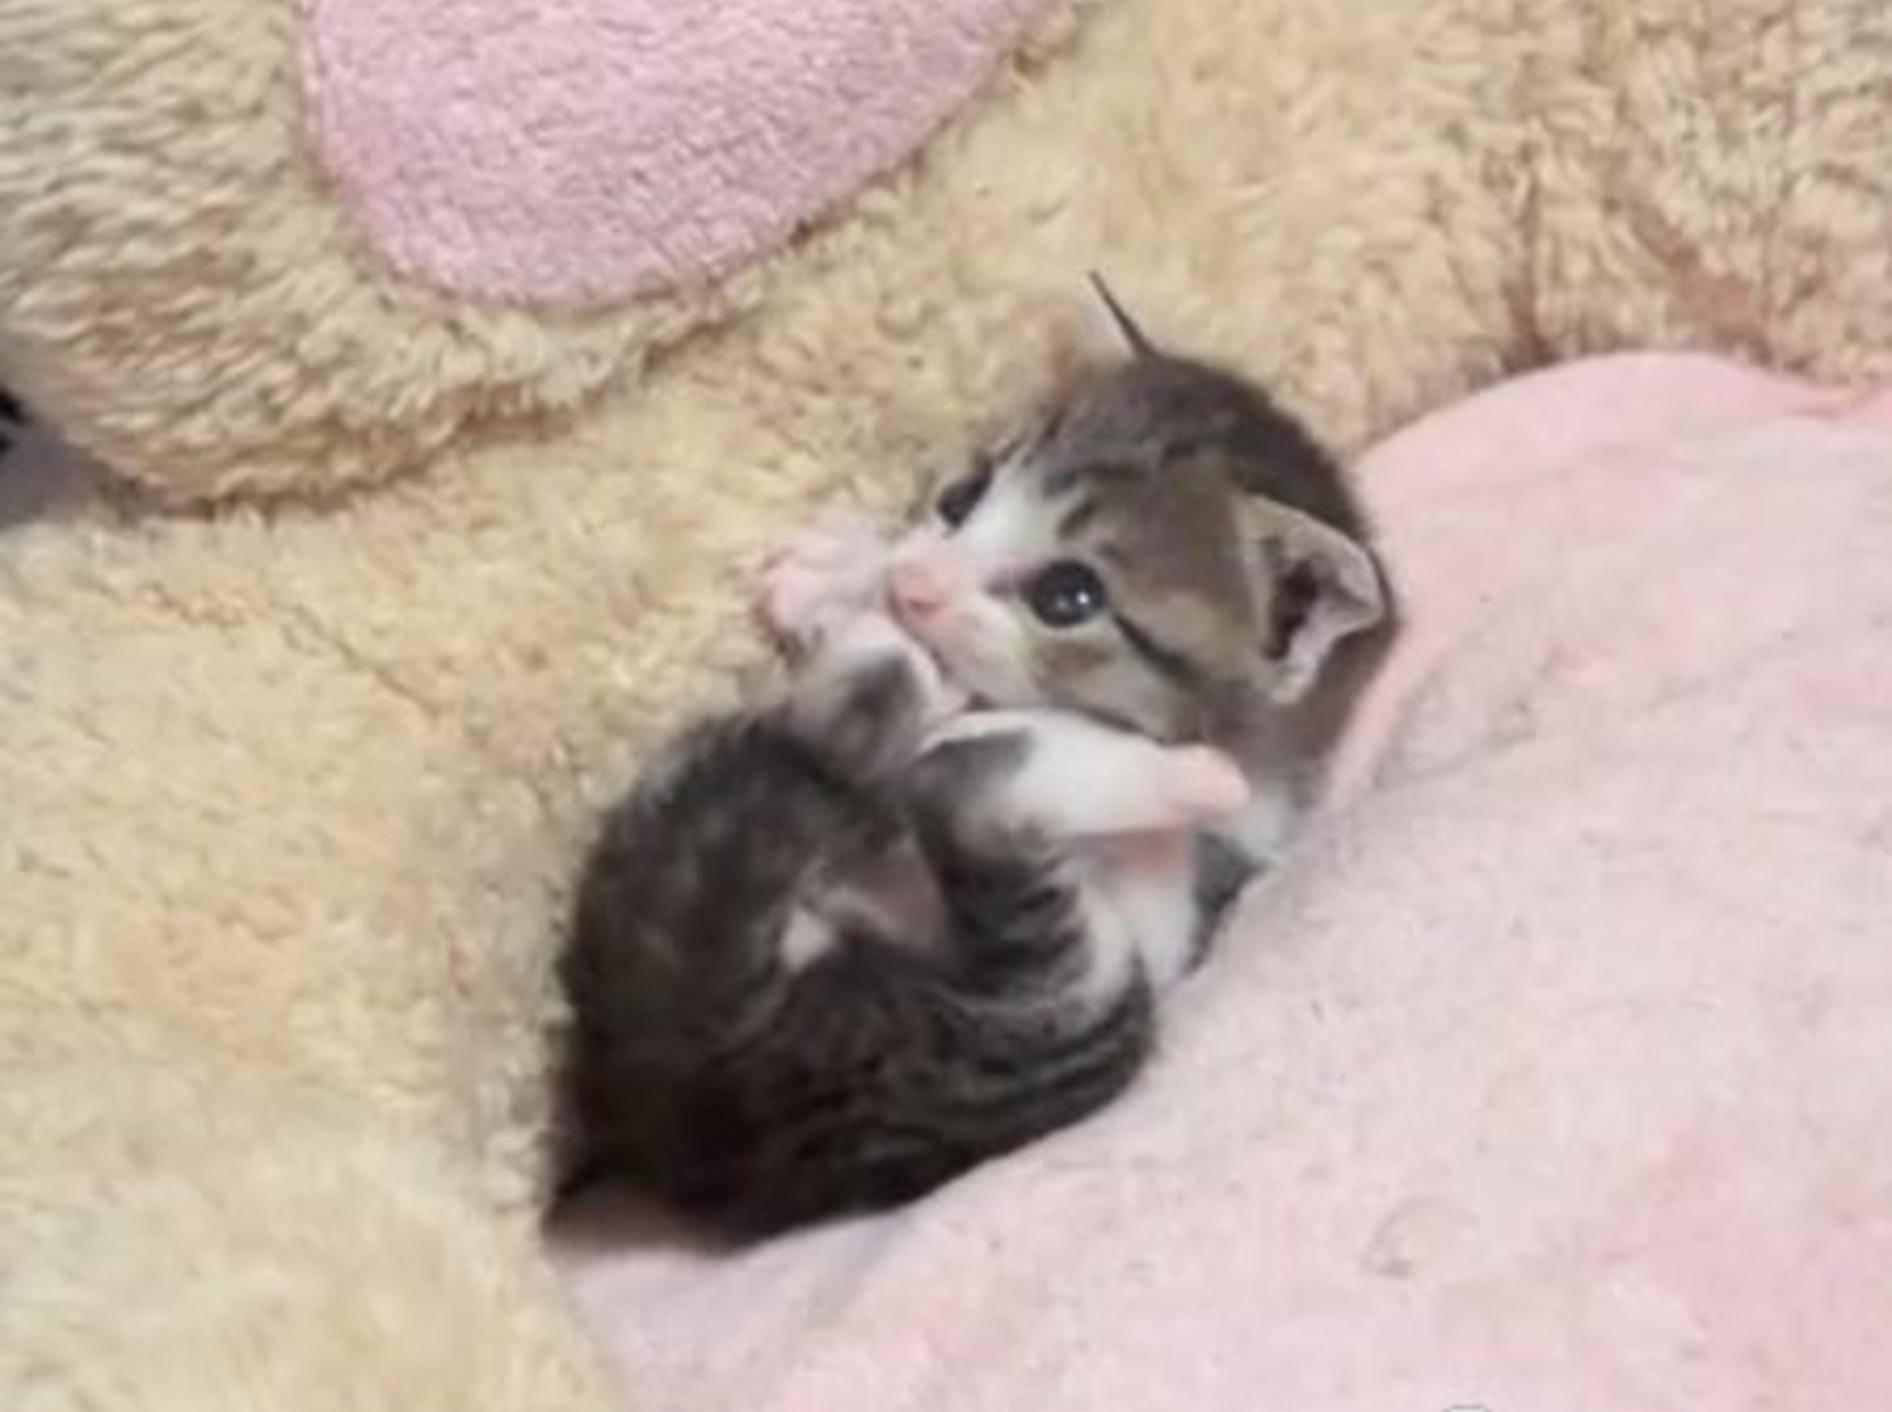 So süß: Ein Minikätzchen macht Katzenwäsche — Bild: Youtube / MAKO0MAKO0